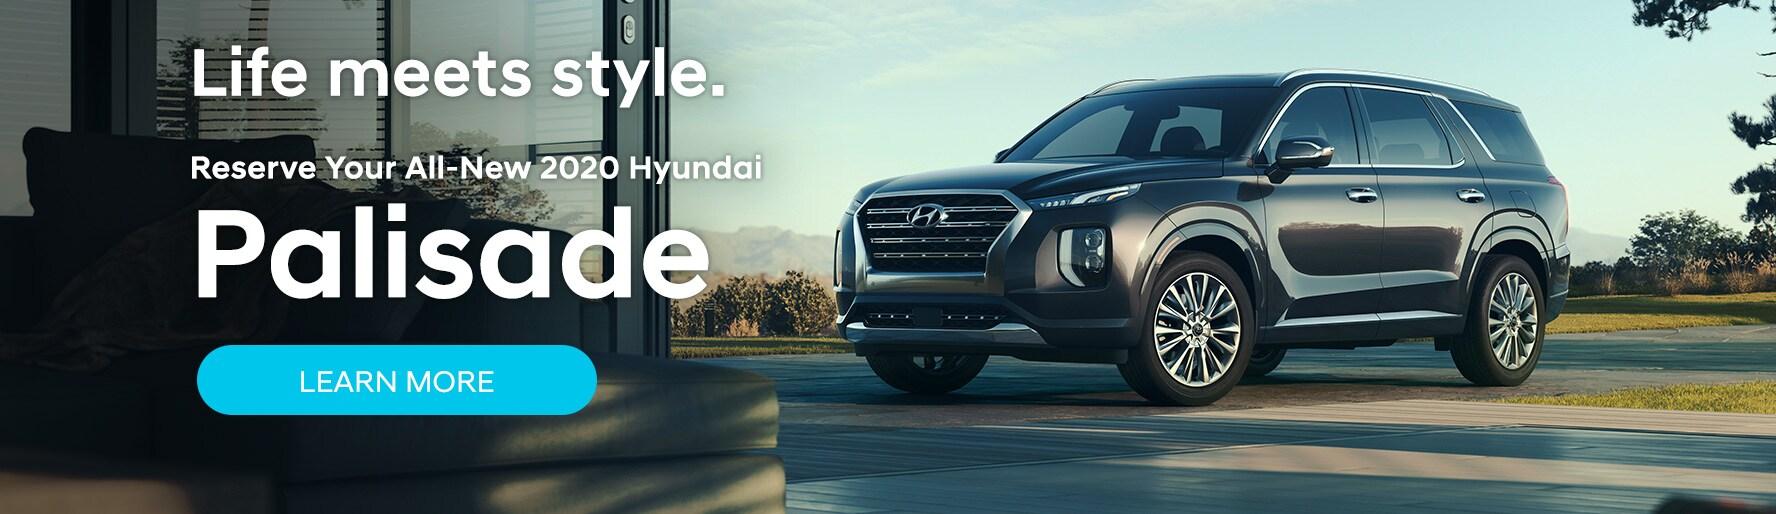 Gettel Hyundai Sarasota >> Sarasota FL Hyundai Dealer | Serving Venice & Sarasota